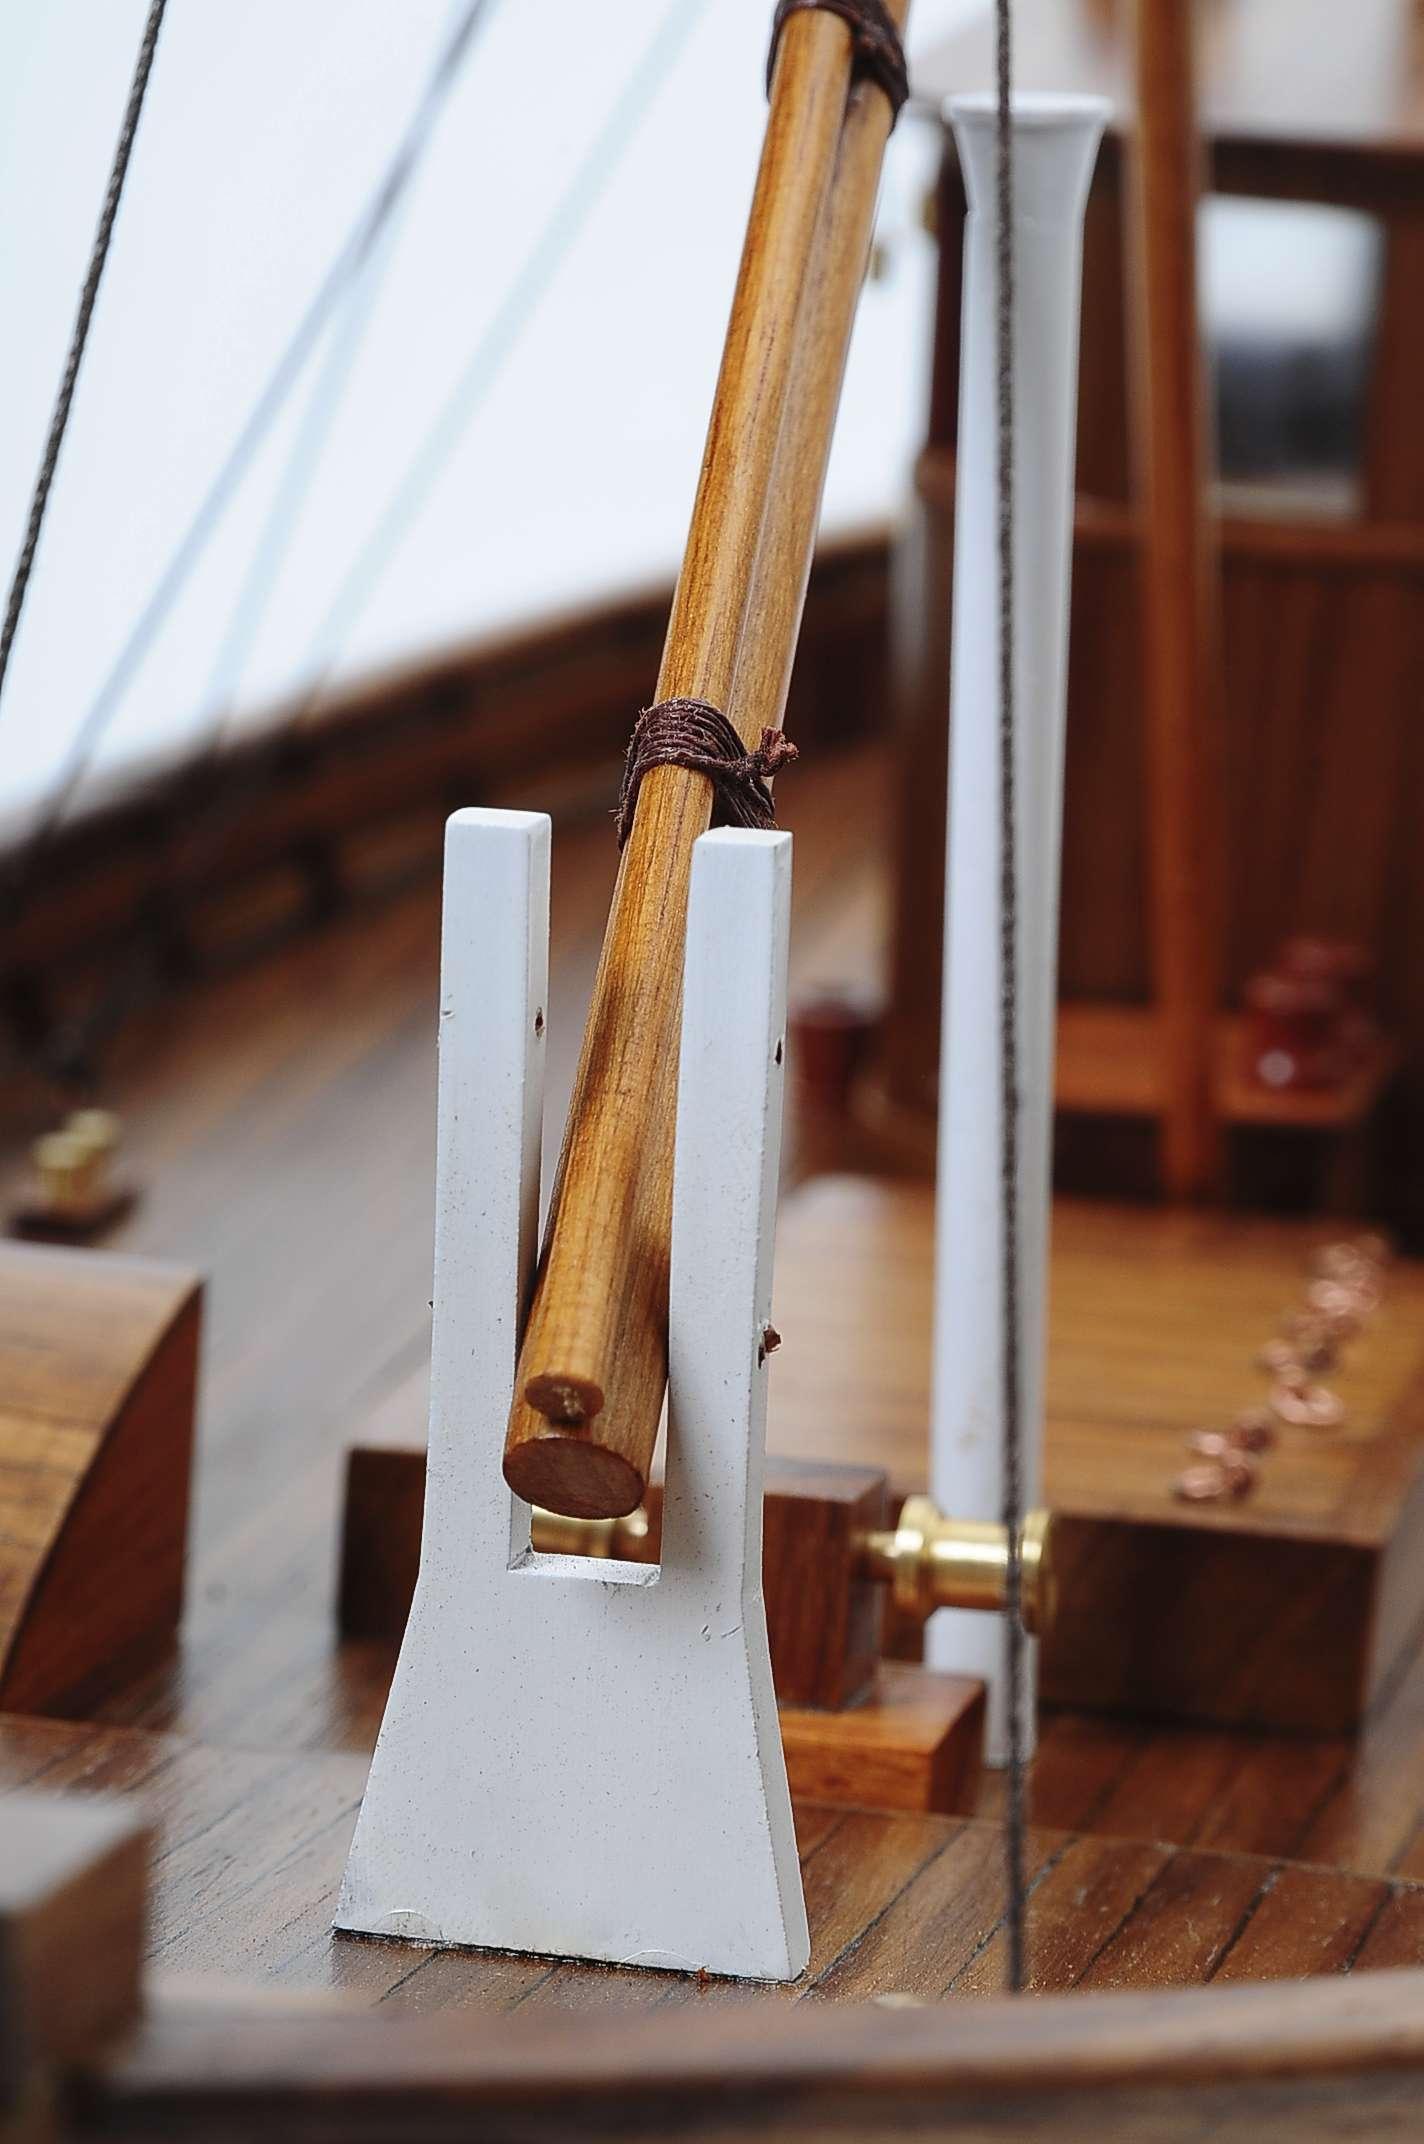 1431-4568-Mary-Mclean-CN193-Model-Boat